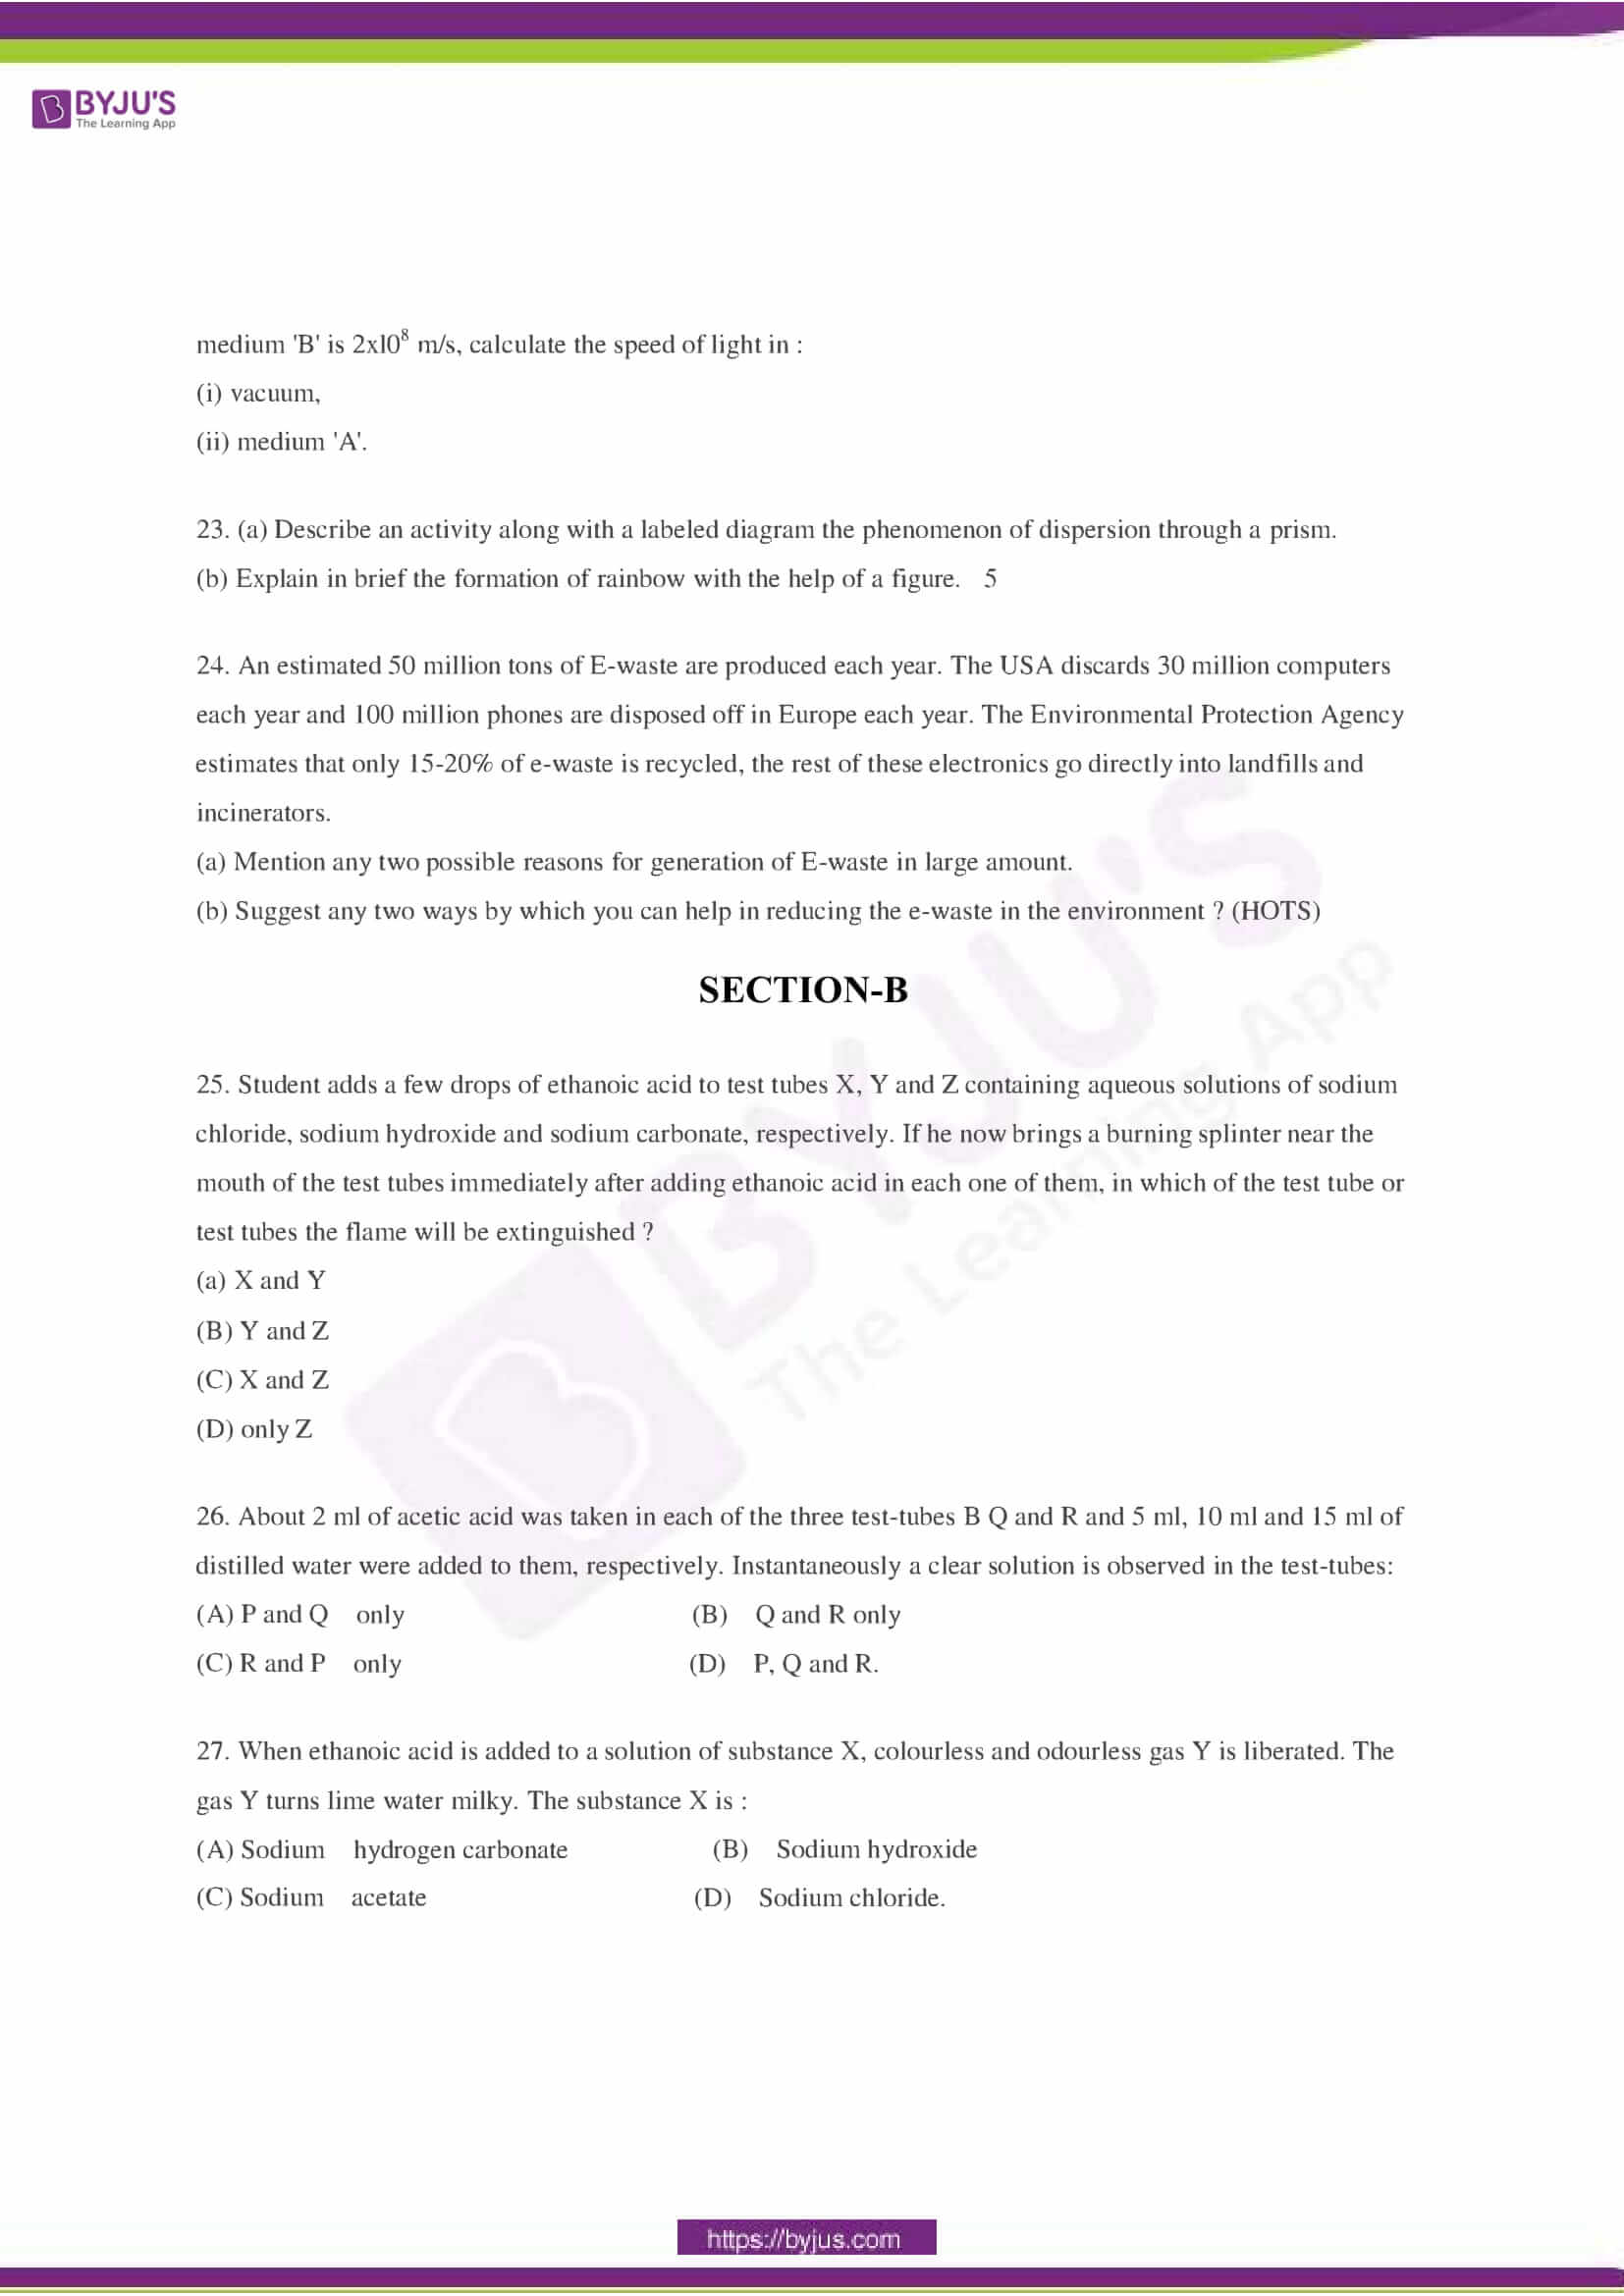 CBSE Class 10 Science Sample Paper Set 2-4